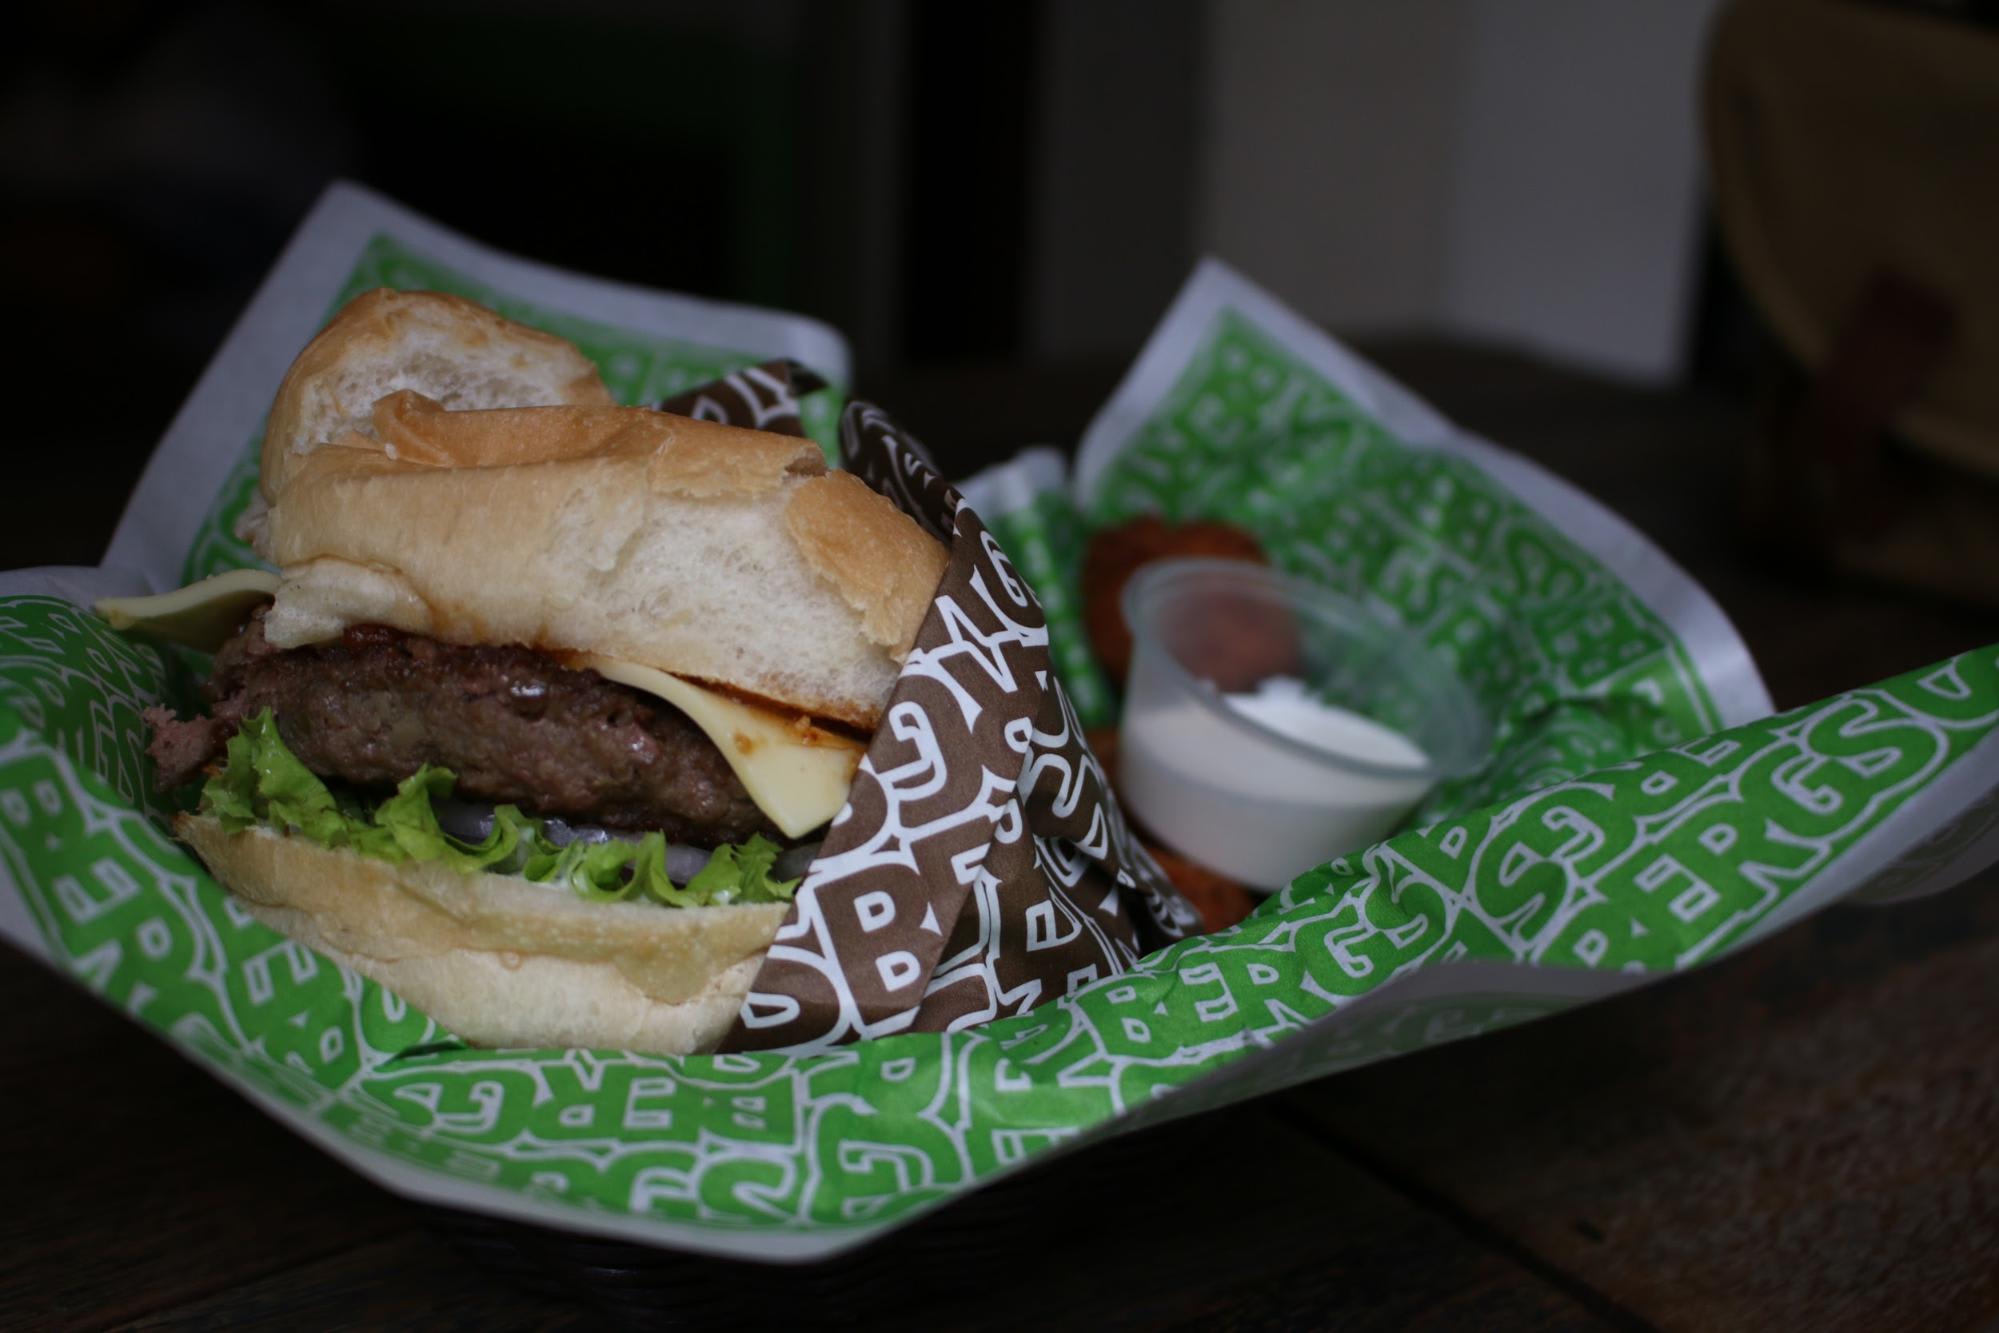 Khám phá Haji Lane: bergs gourmet burger